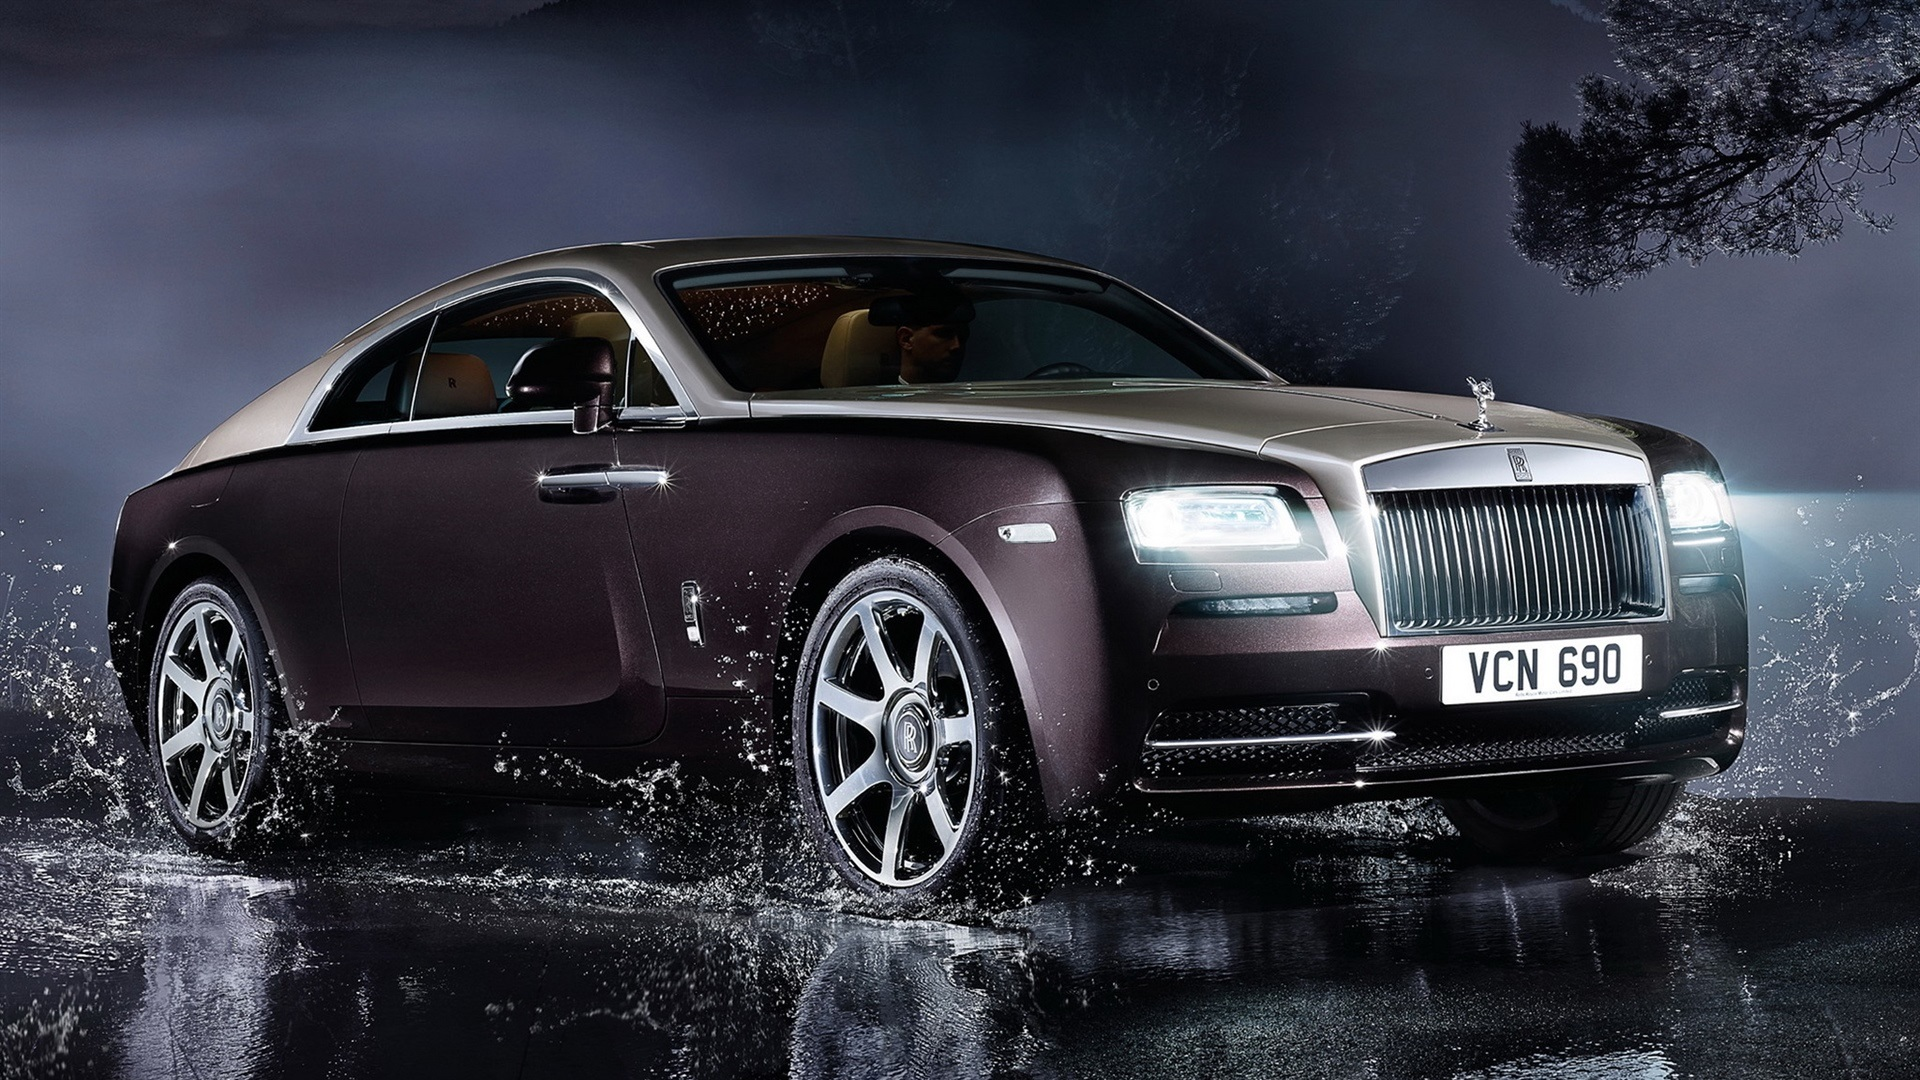 The Best 100 Hd And Qhd Wallpapers From 2015 Works For: Fonds D'écran Télécharger 1920x1080 Rolls-Royce Voiture De